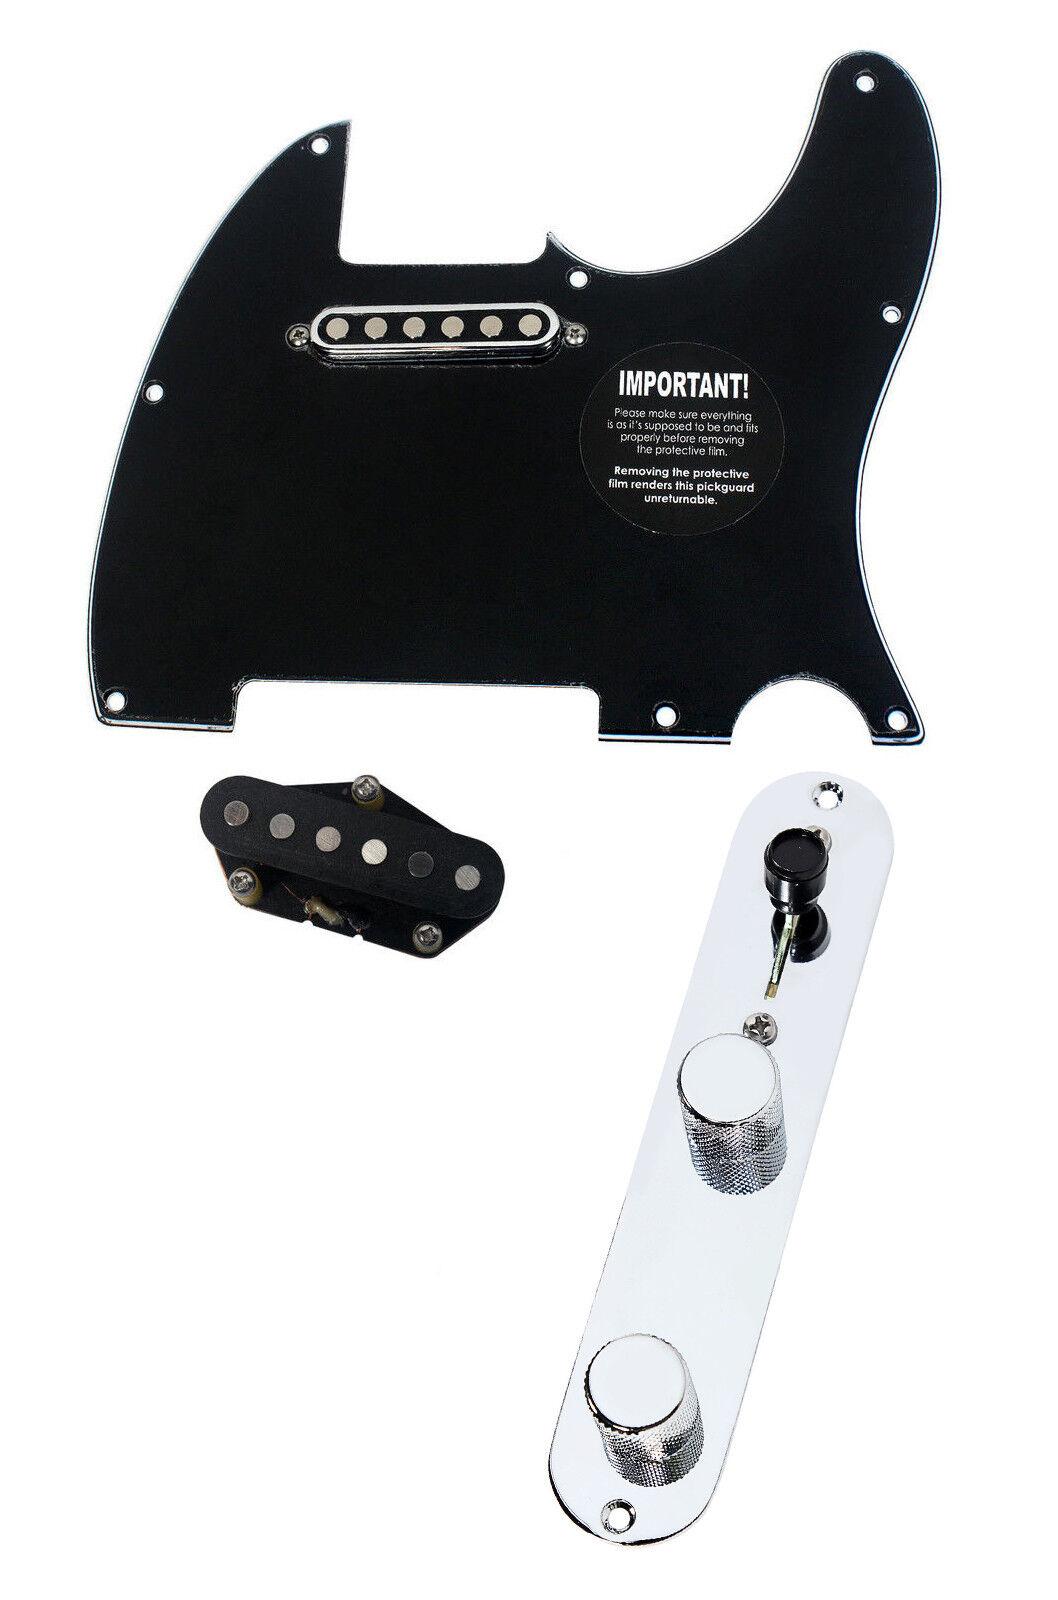 920D Fender Telecaster pickguard cargada cargada cargada Tv Jones Tele Pastillas T4W BK 6f89f6